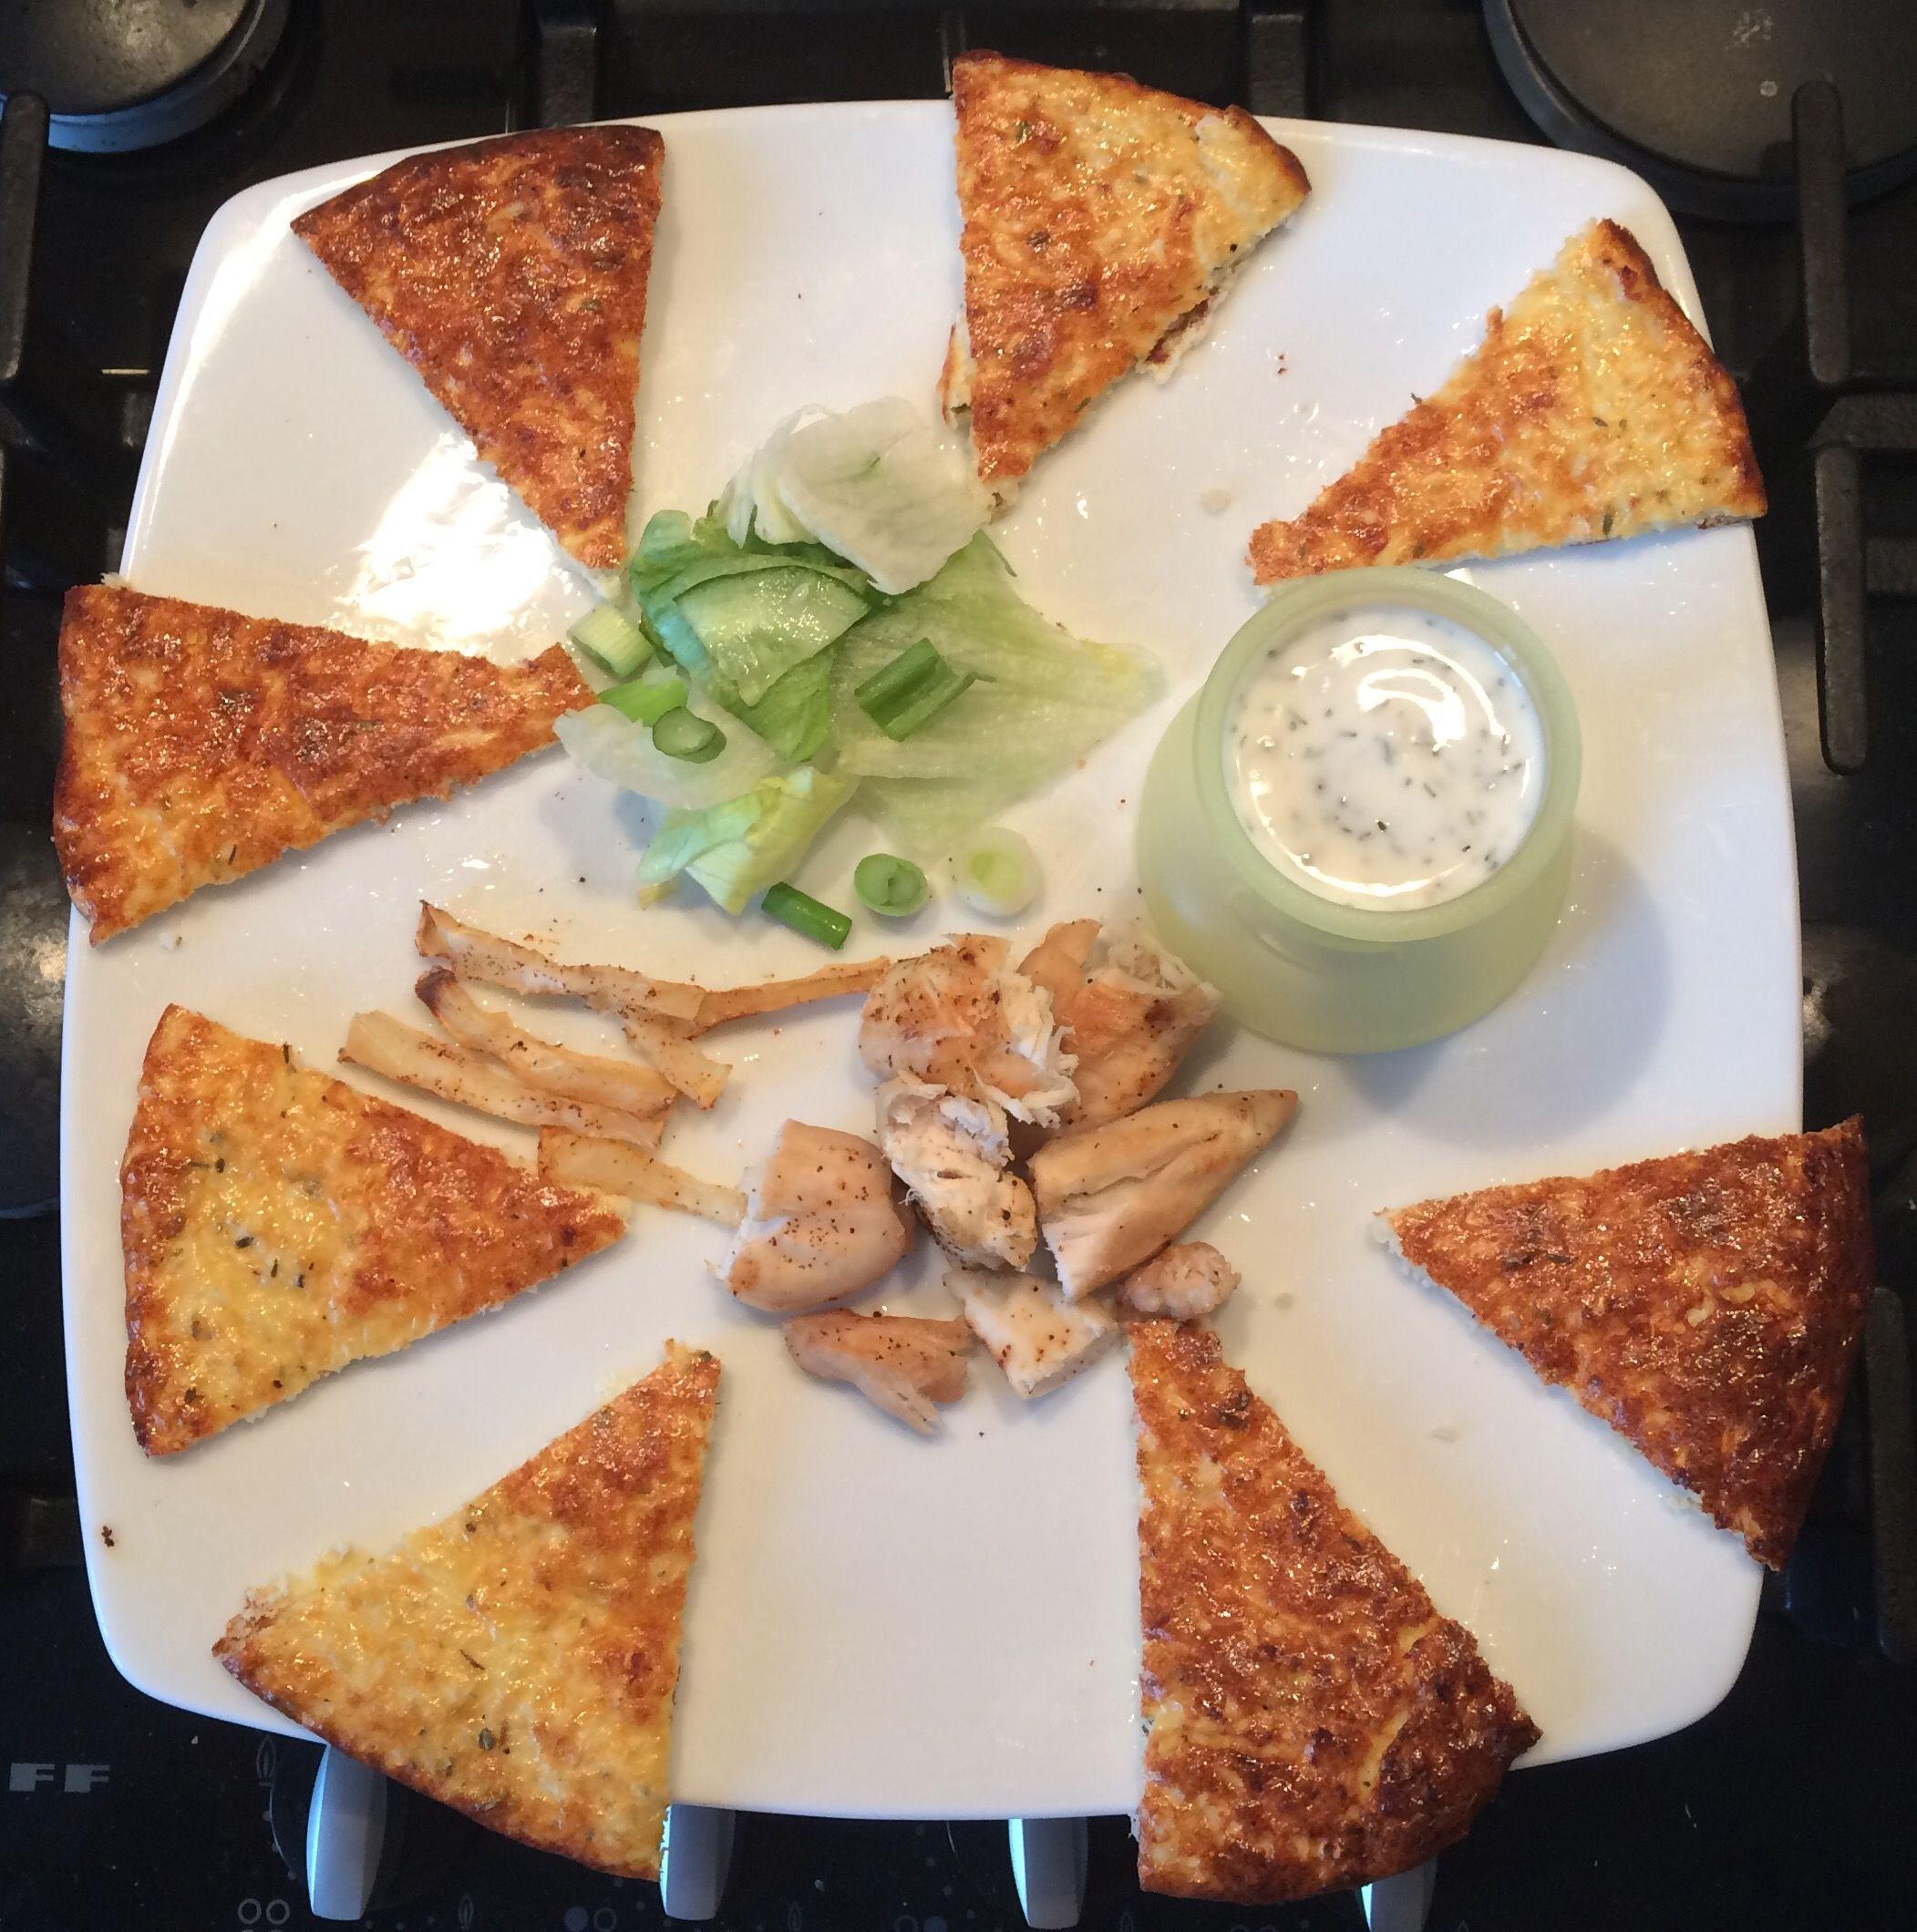 Mini Chicken And Chips With Caulibread Triangles Cauliflower Bread